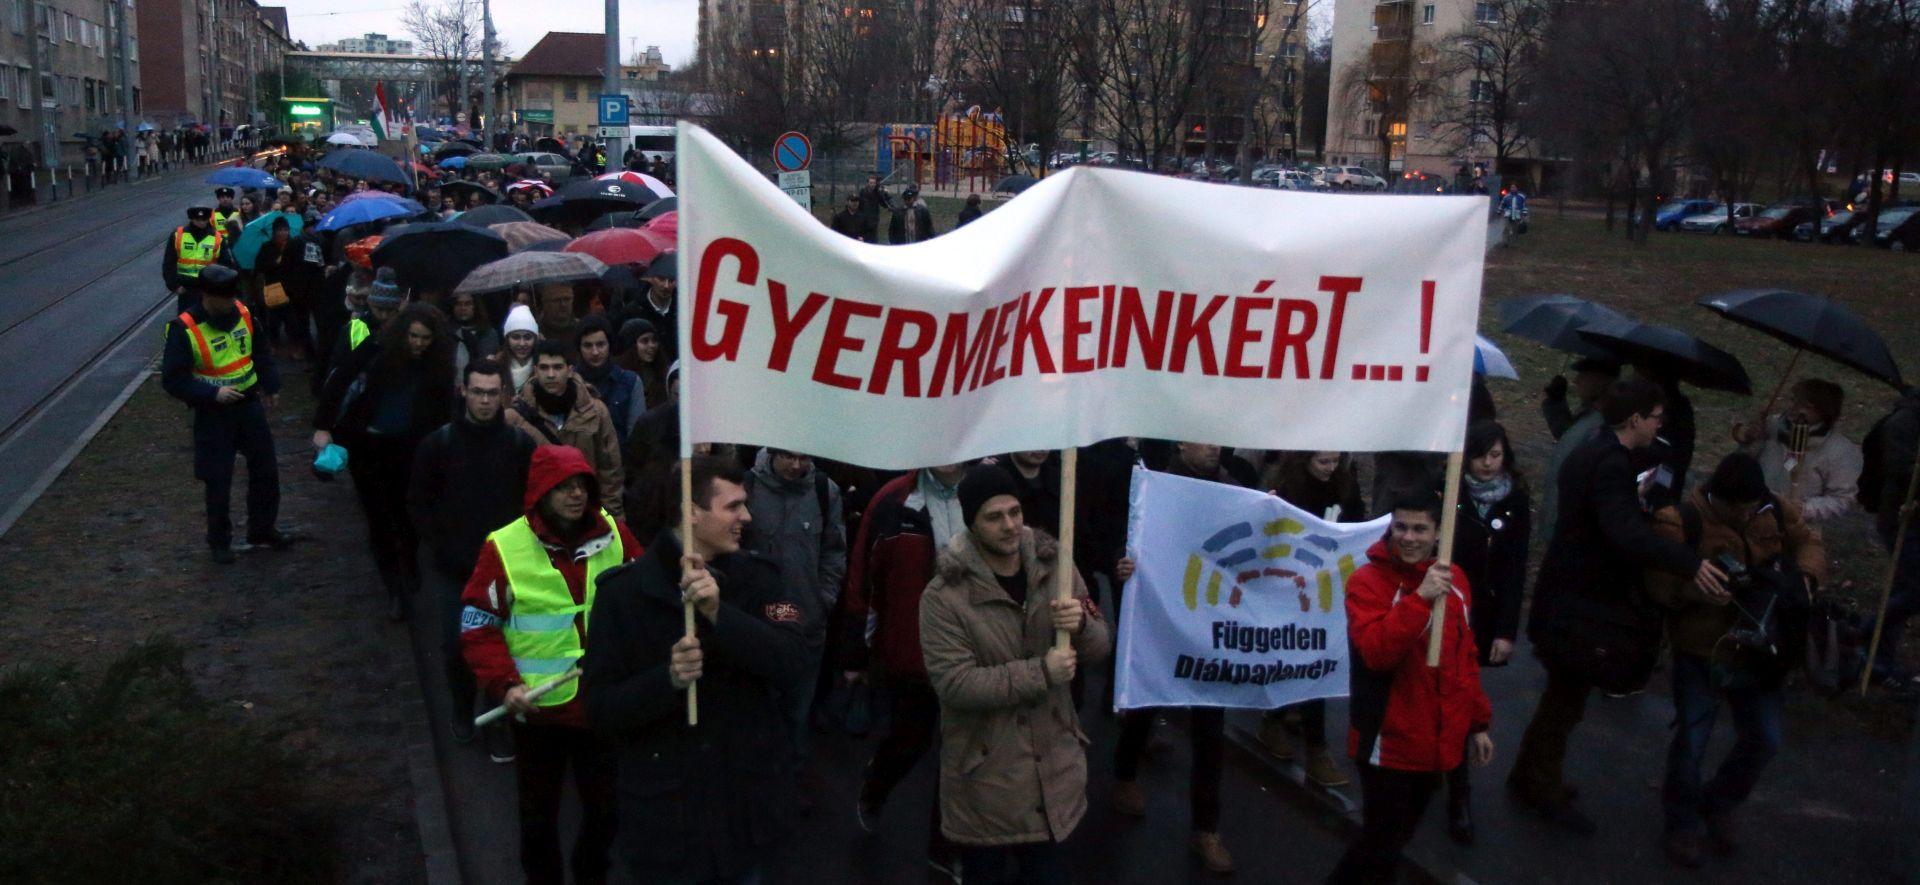 Mađarska: Prosvjed protiv reforme školstva Viktora Orbana